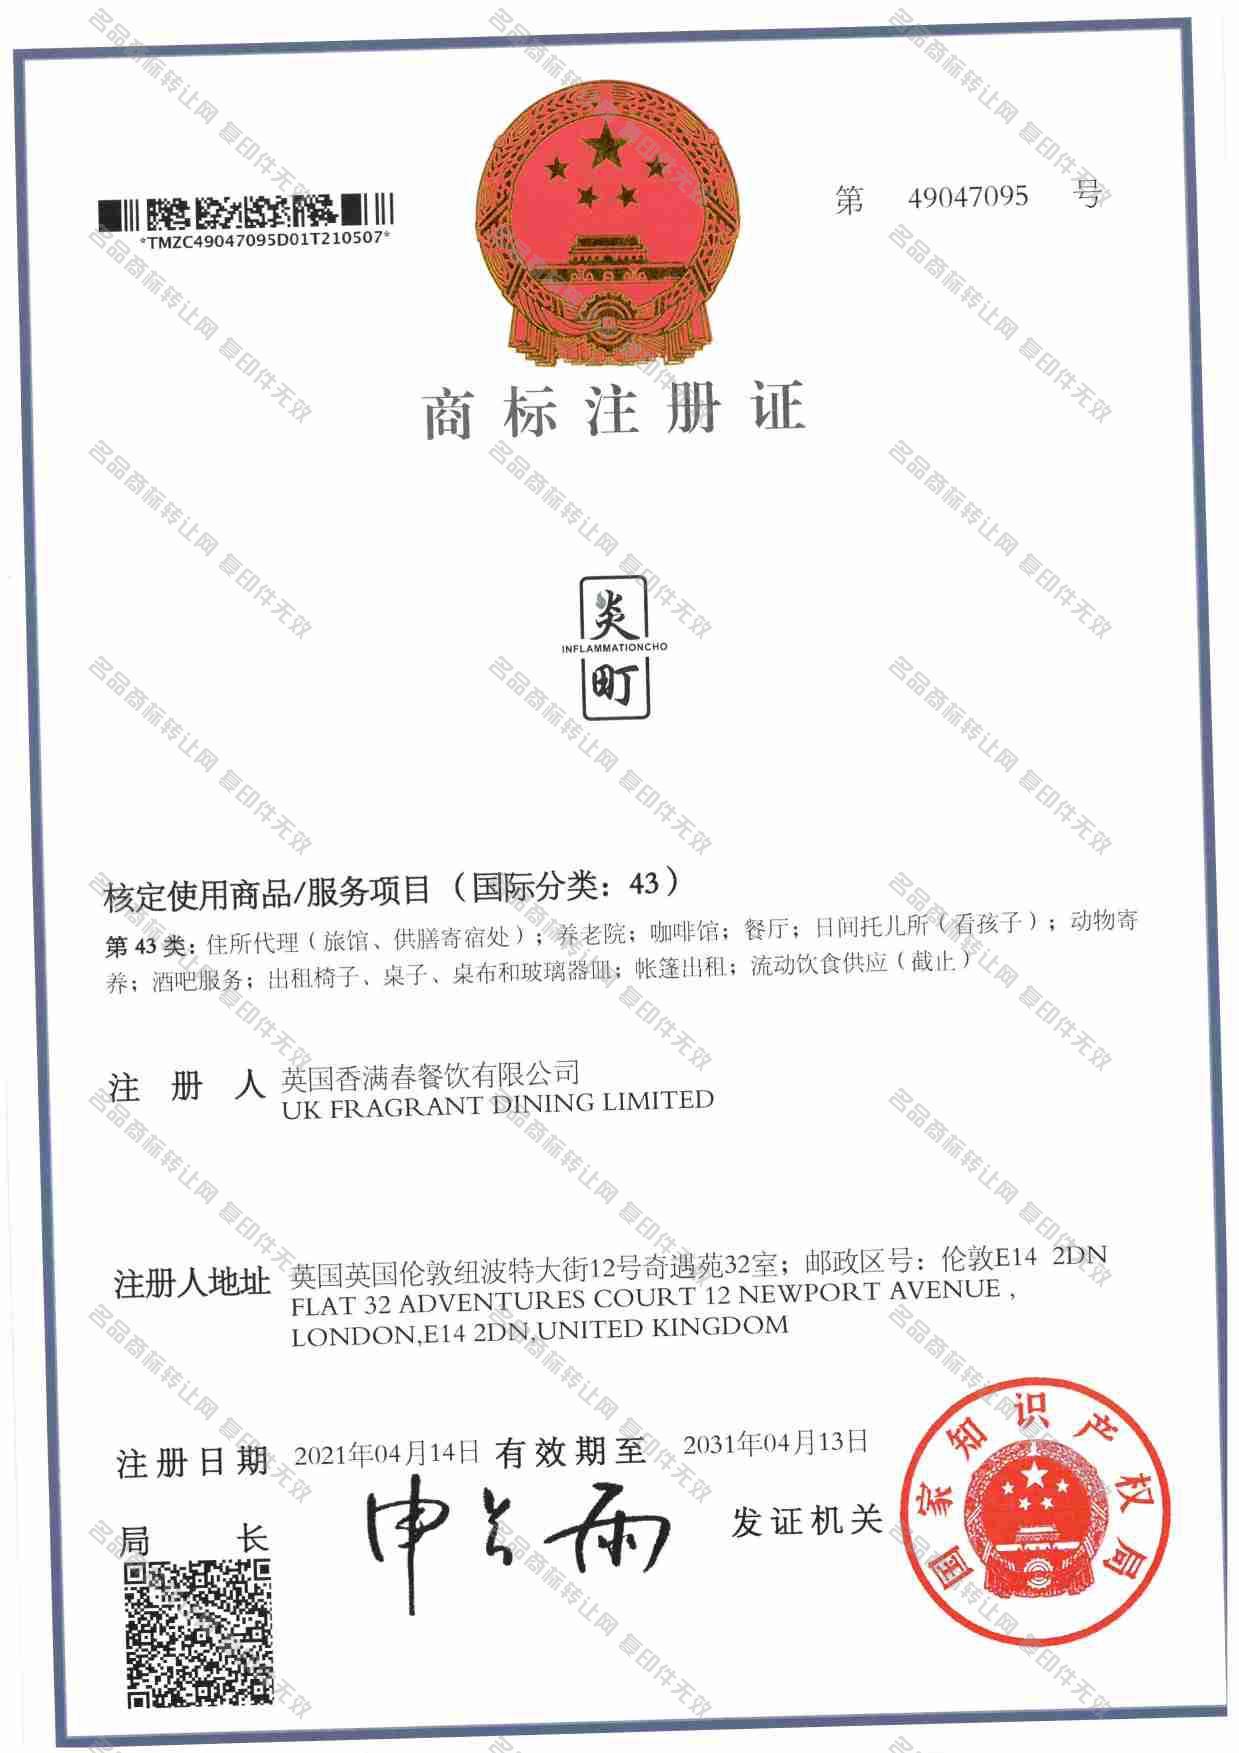 炎町 INFLAMMATIONCHO注册证